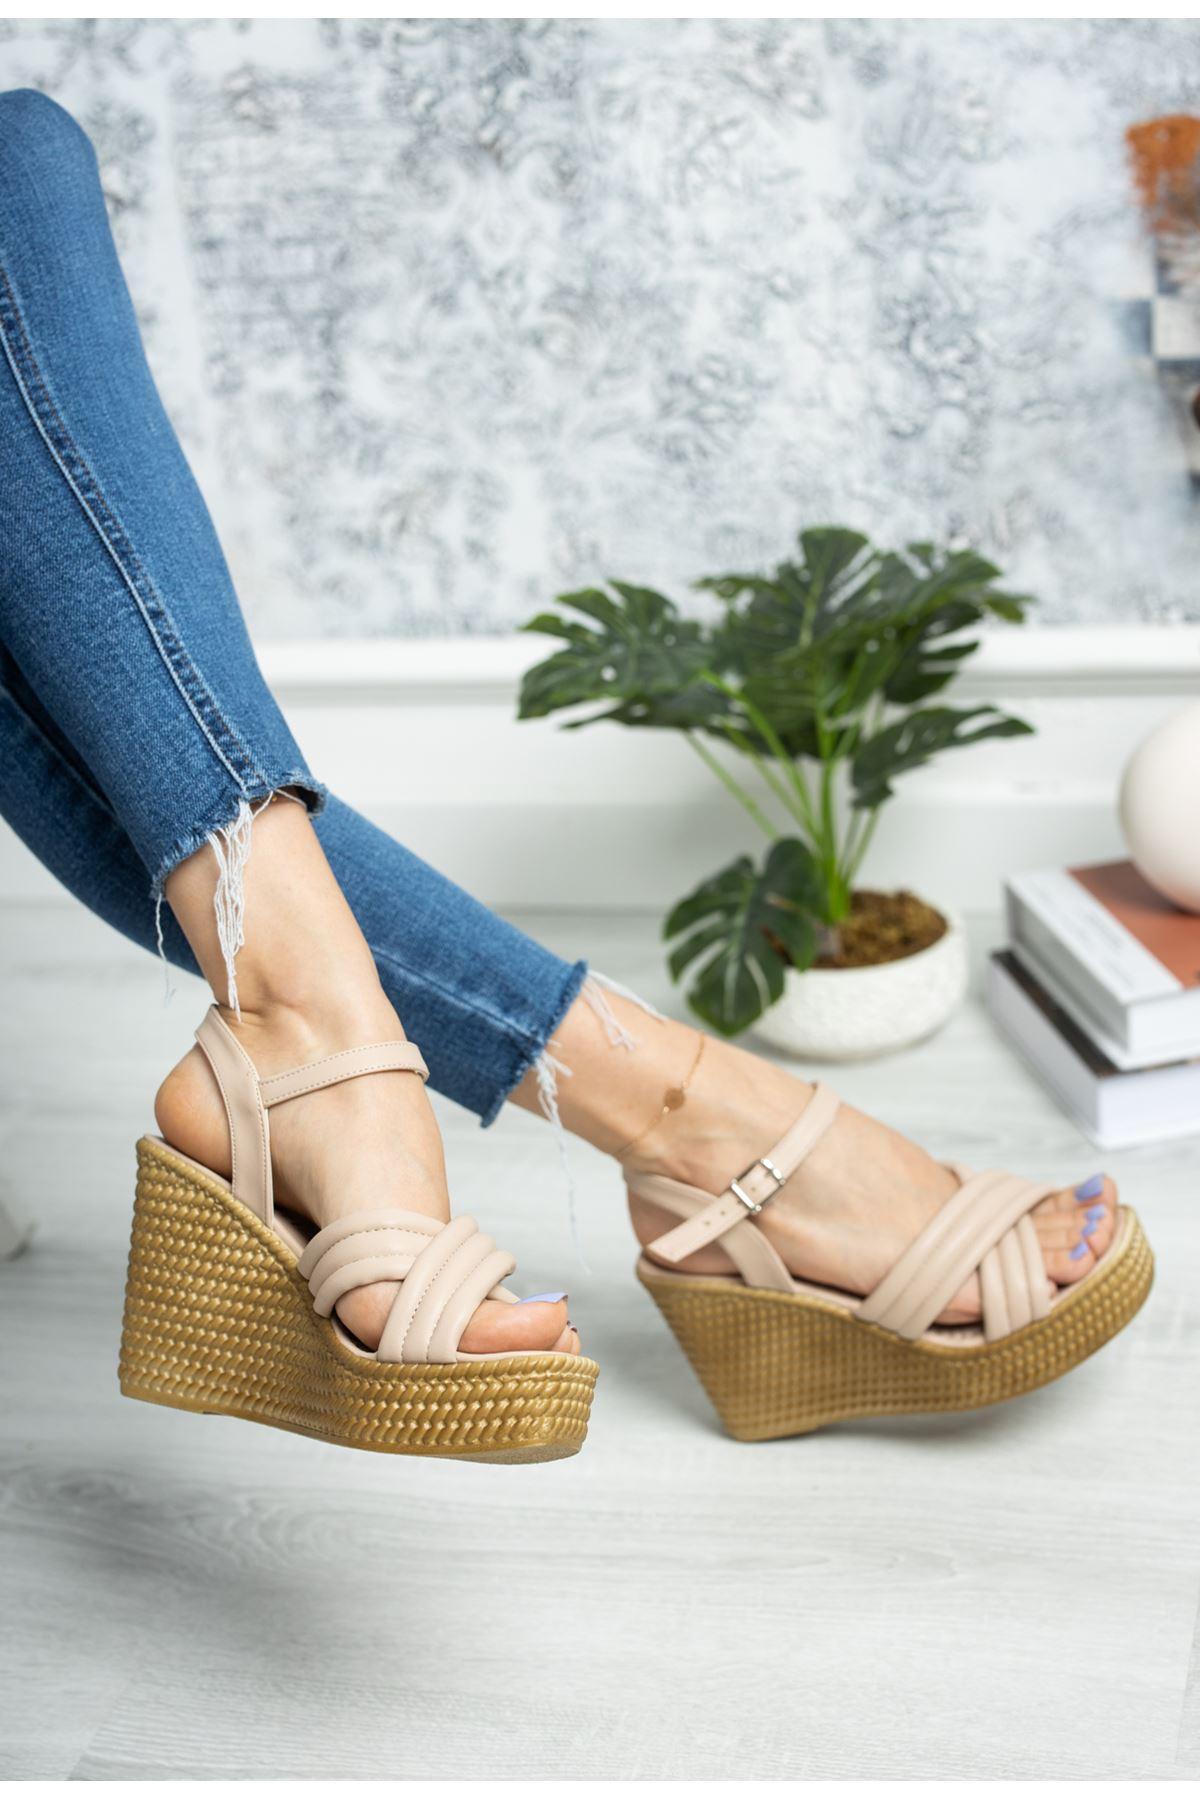 Dolgu Taban Çapraz Model Krem Sandalet